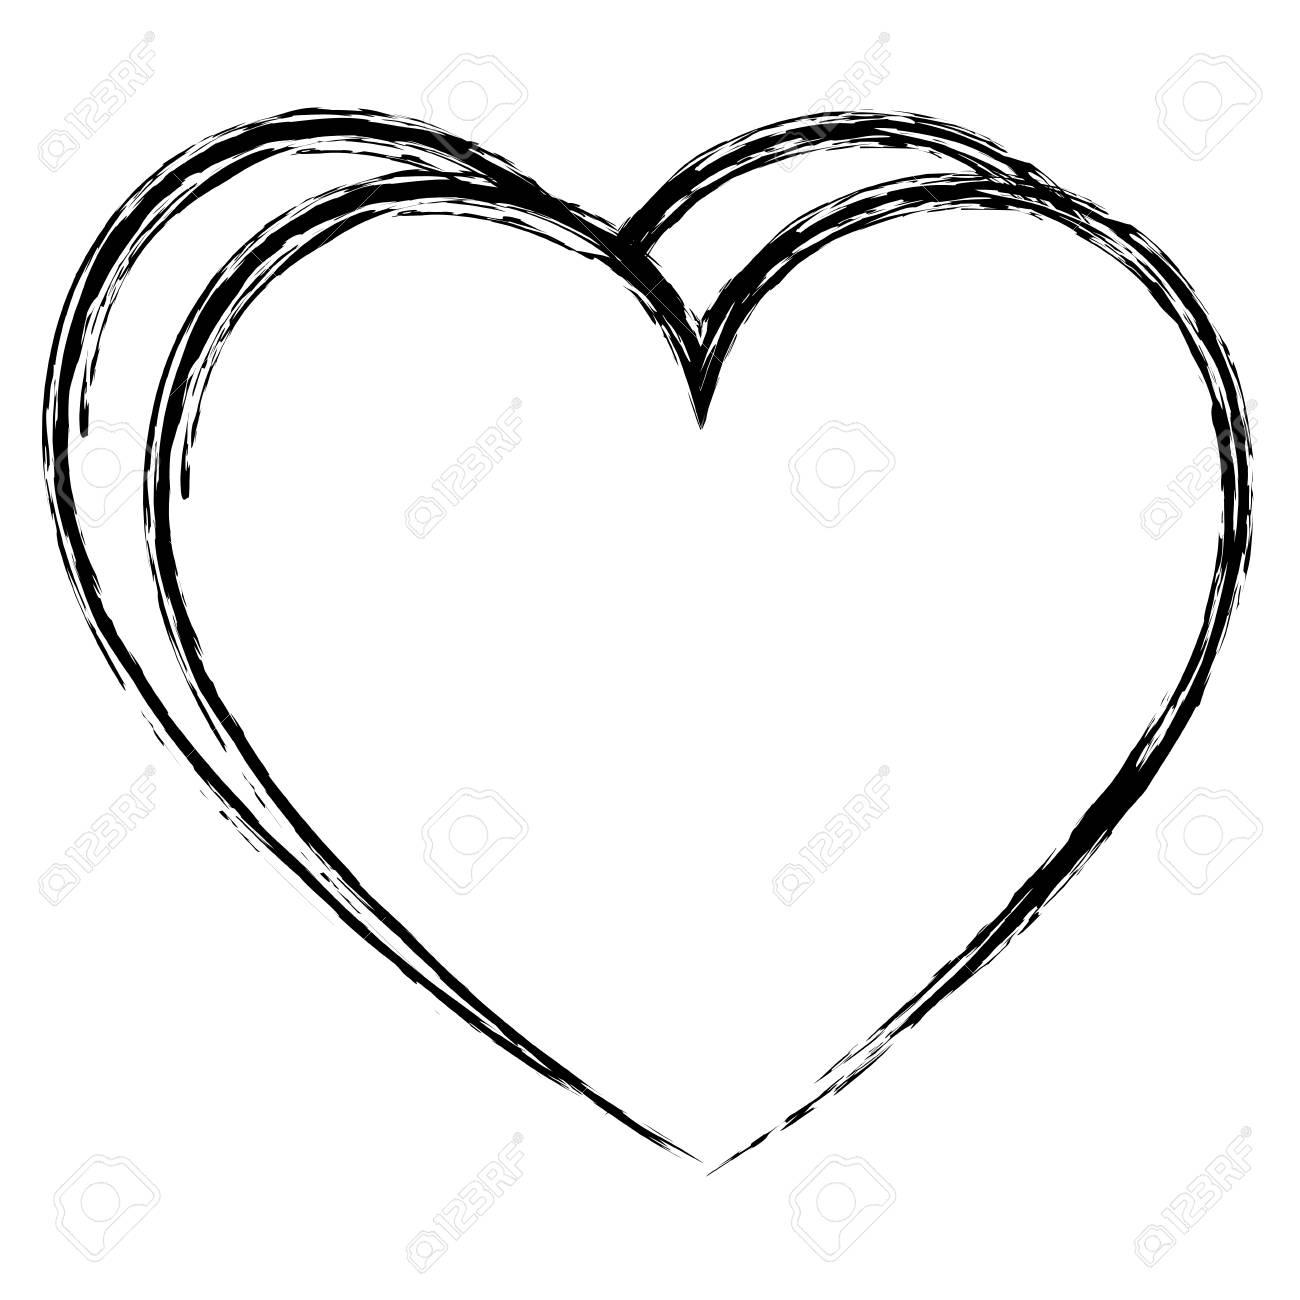 heart love isolated icon vector illustration design - 98595763